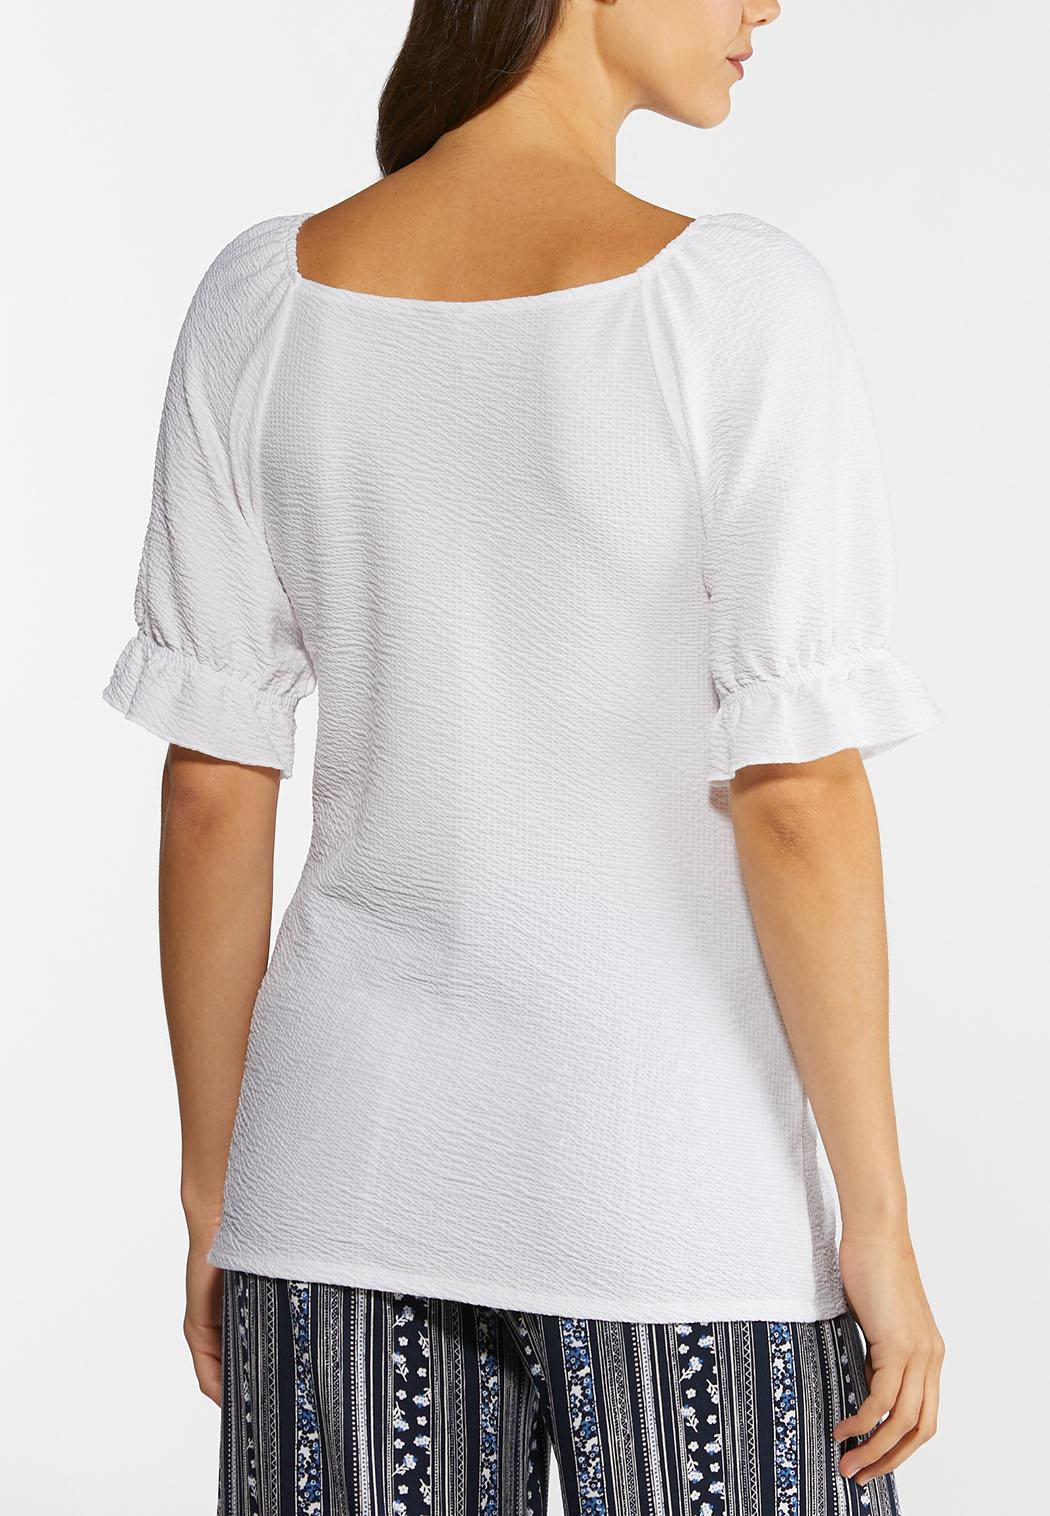 Plus Size White Textured Top (Item #44290850)